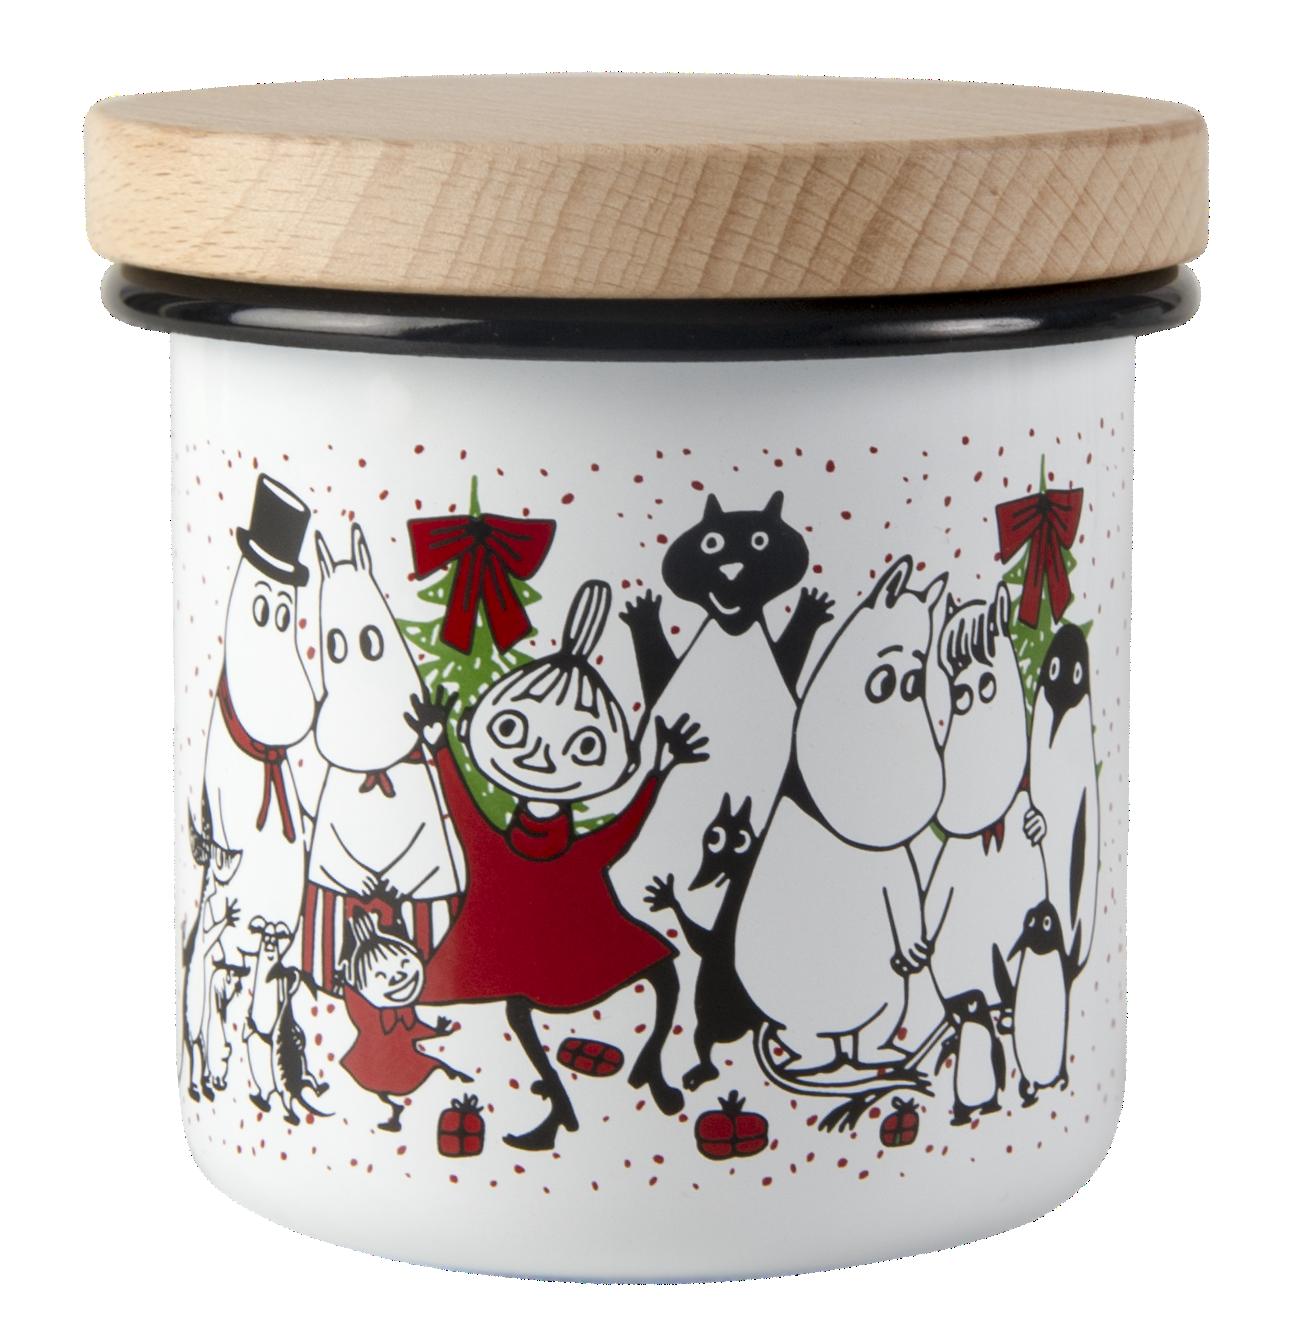 Muurla Moomin Winter Magic enamel jar with wooden lid 3,7dl